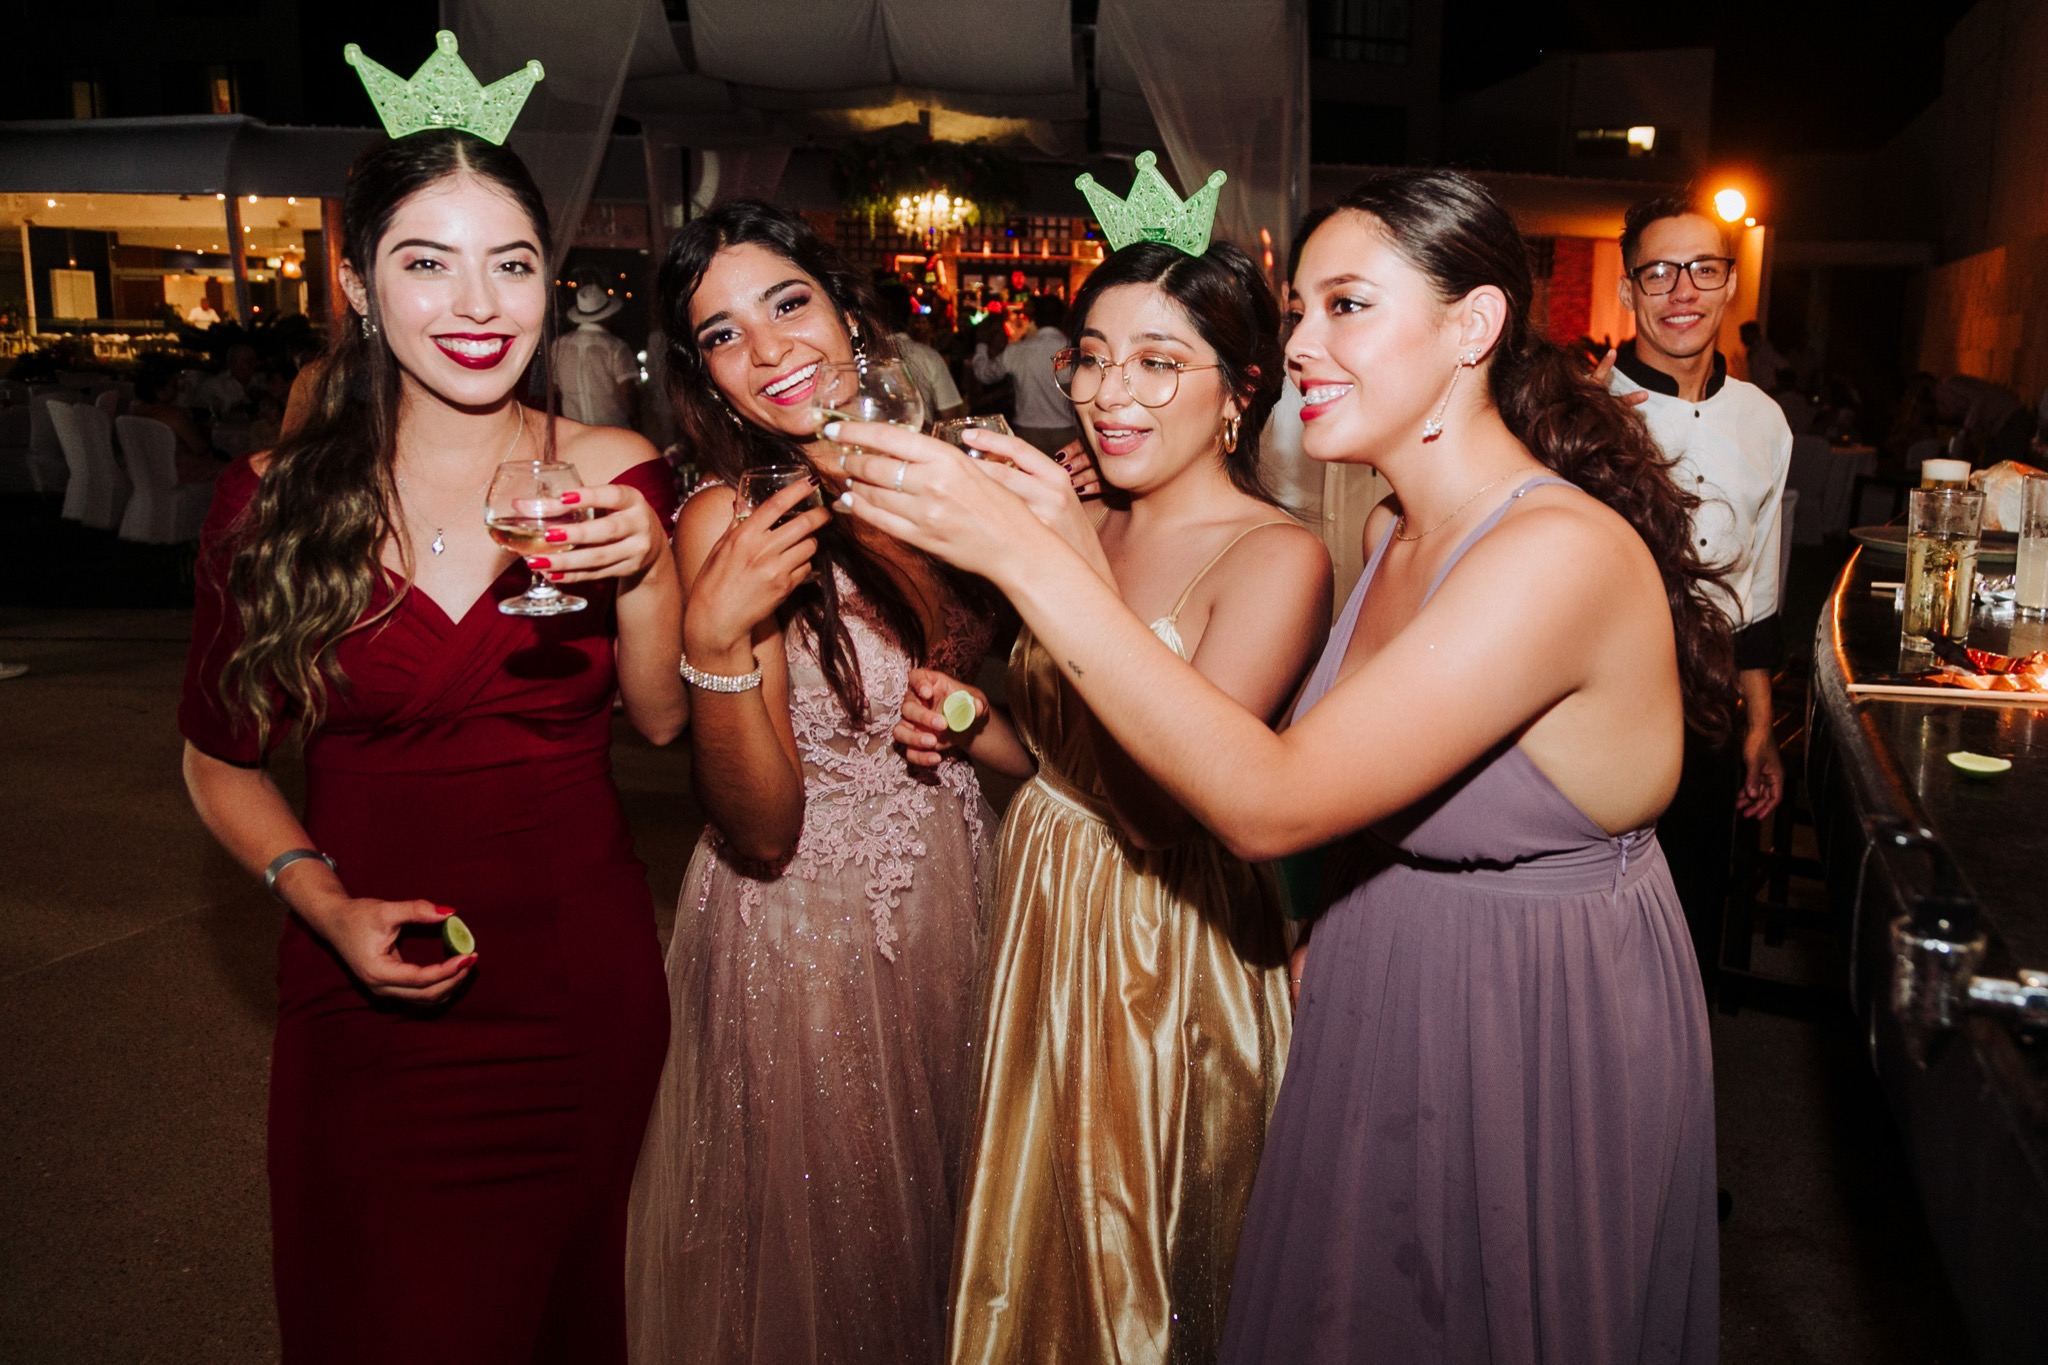 Javier_noriega_fotografo_bodas_profesional_zacatecas_mexico_mazatlan_sinaloa_photographer_weddings84